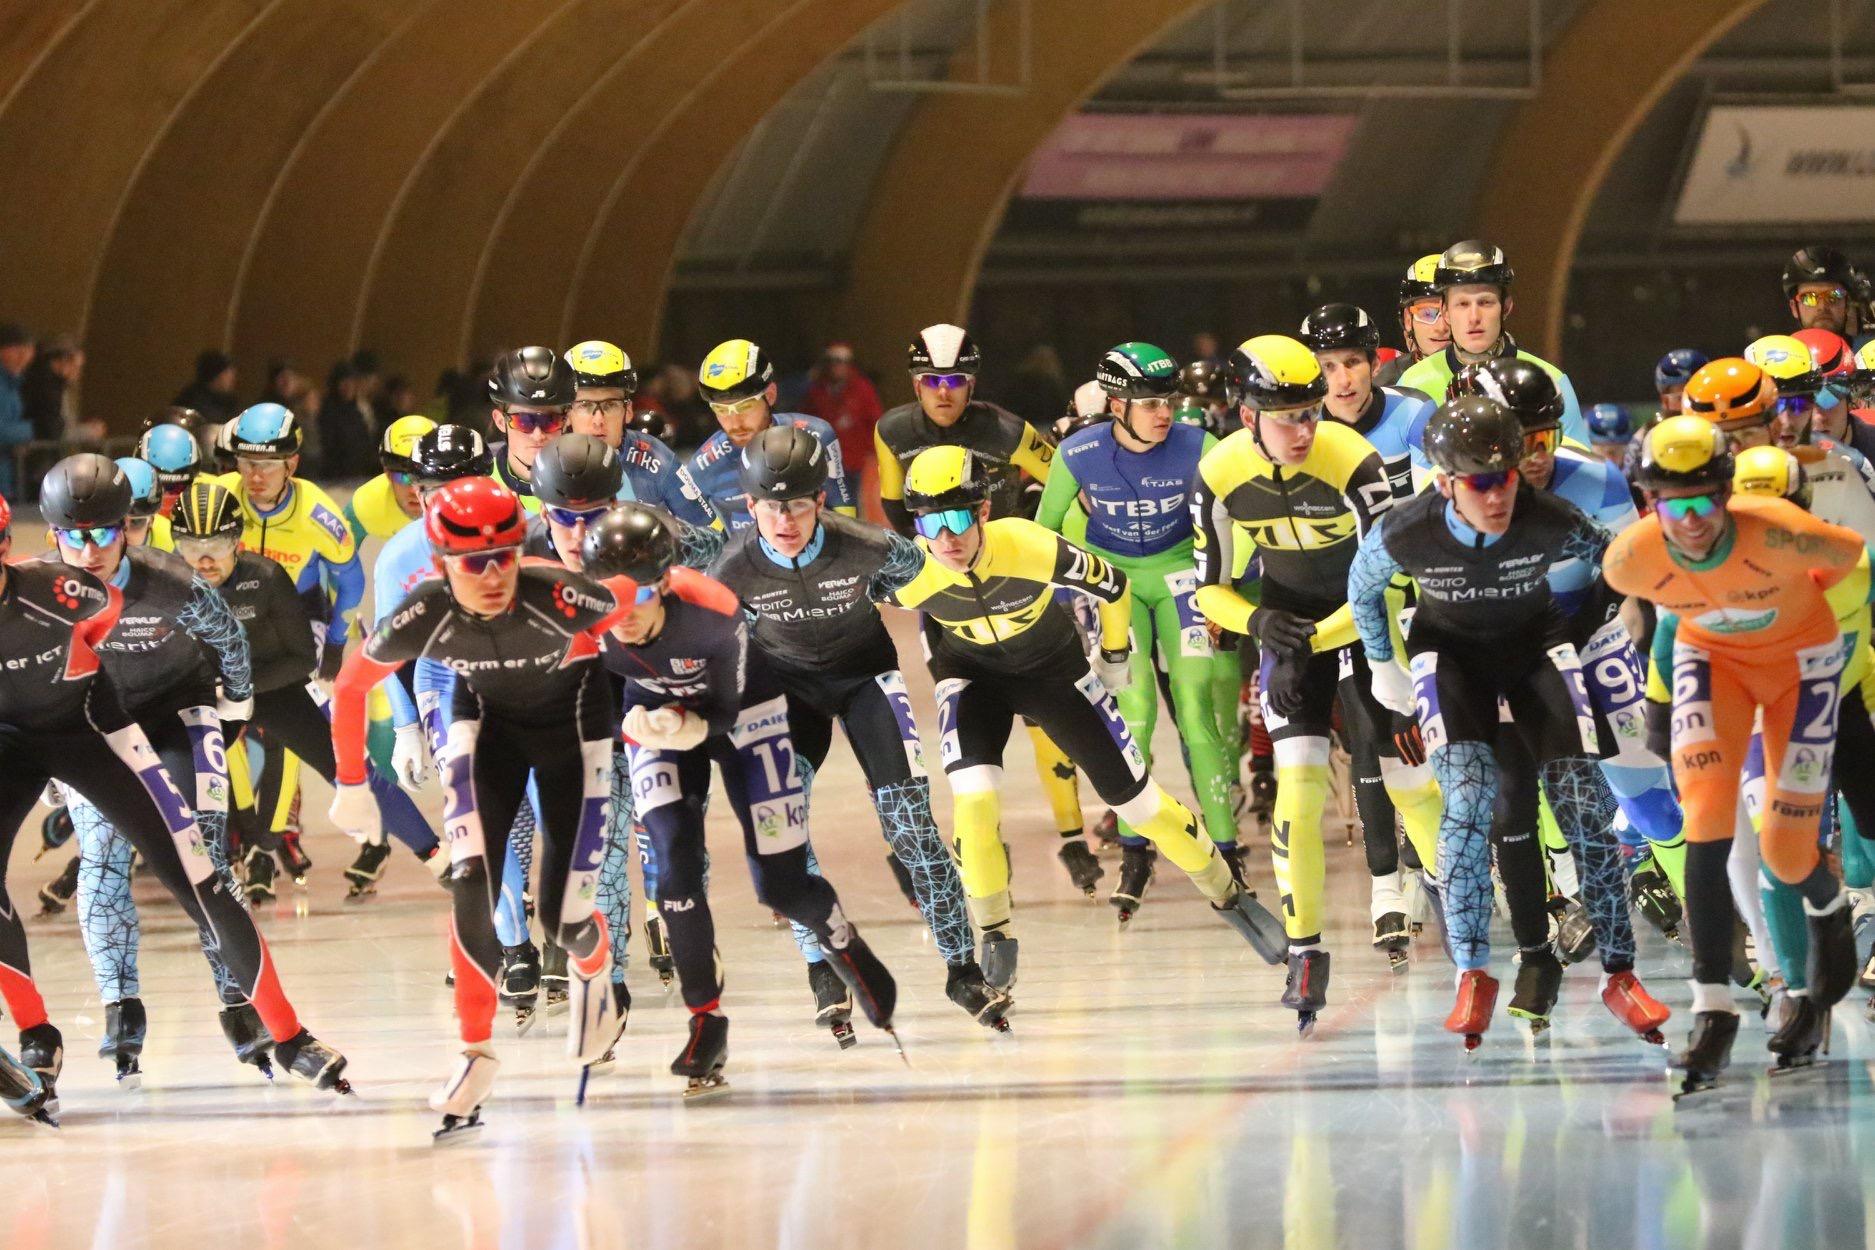 Merito hoofdsponsor team Skateforce